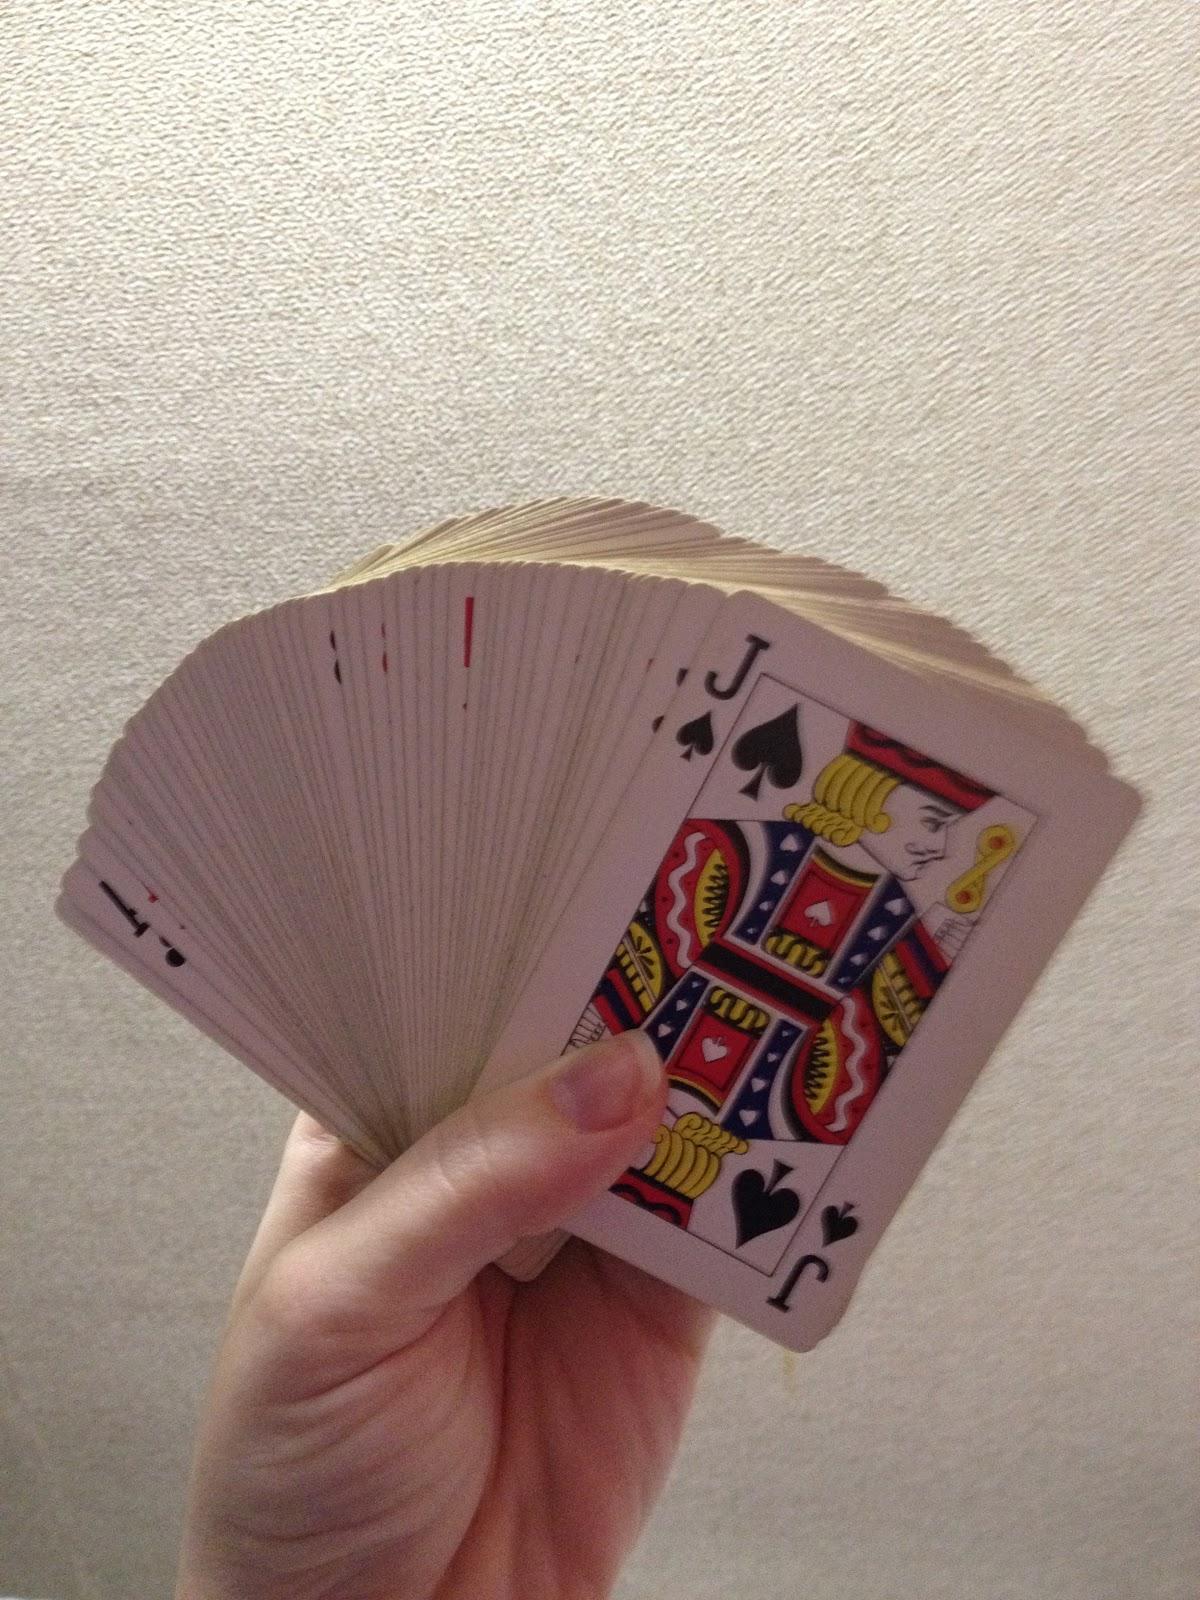 how to make a deck with naxxramas cards